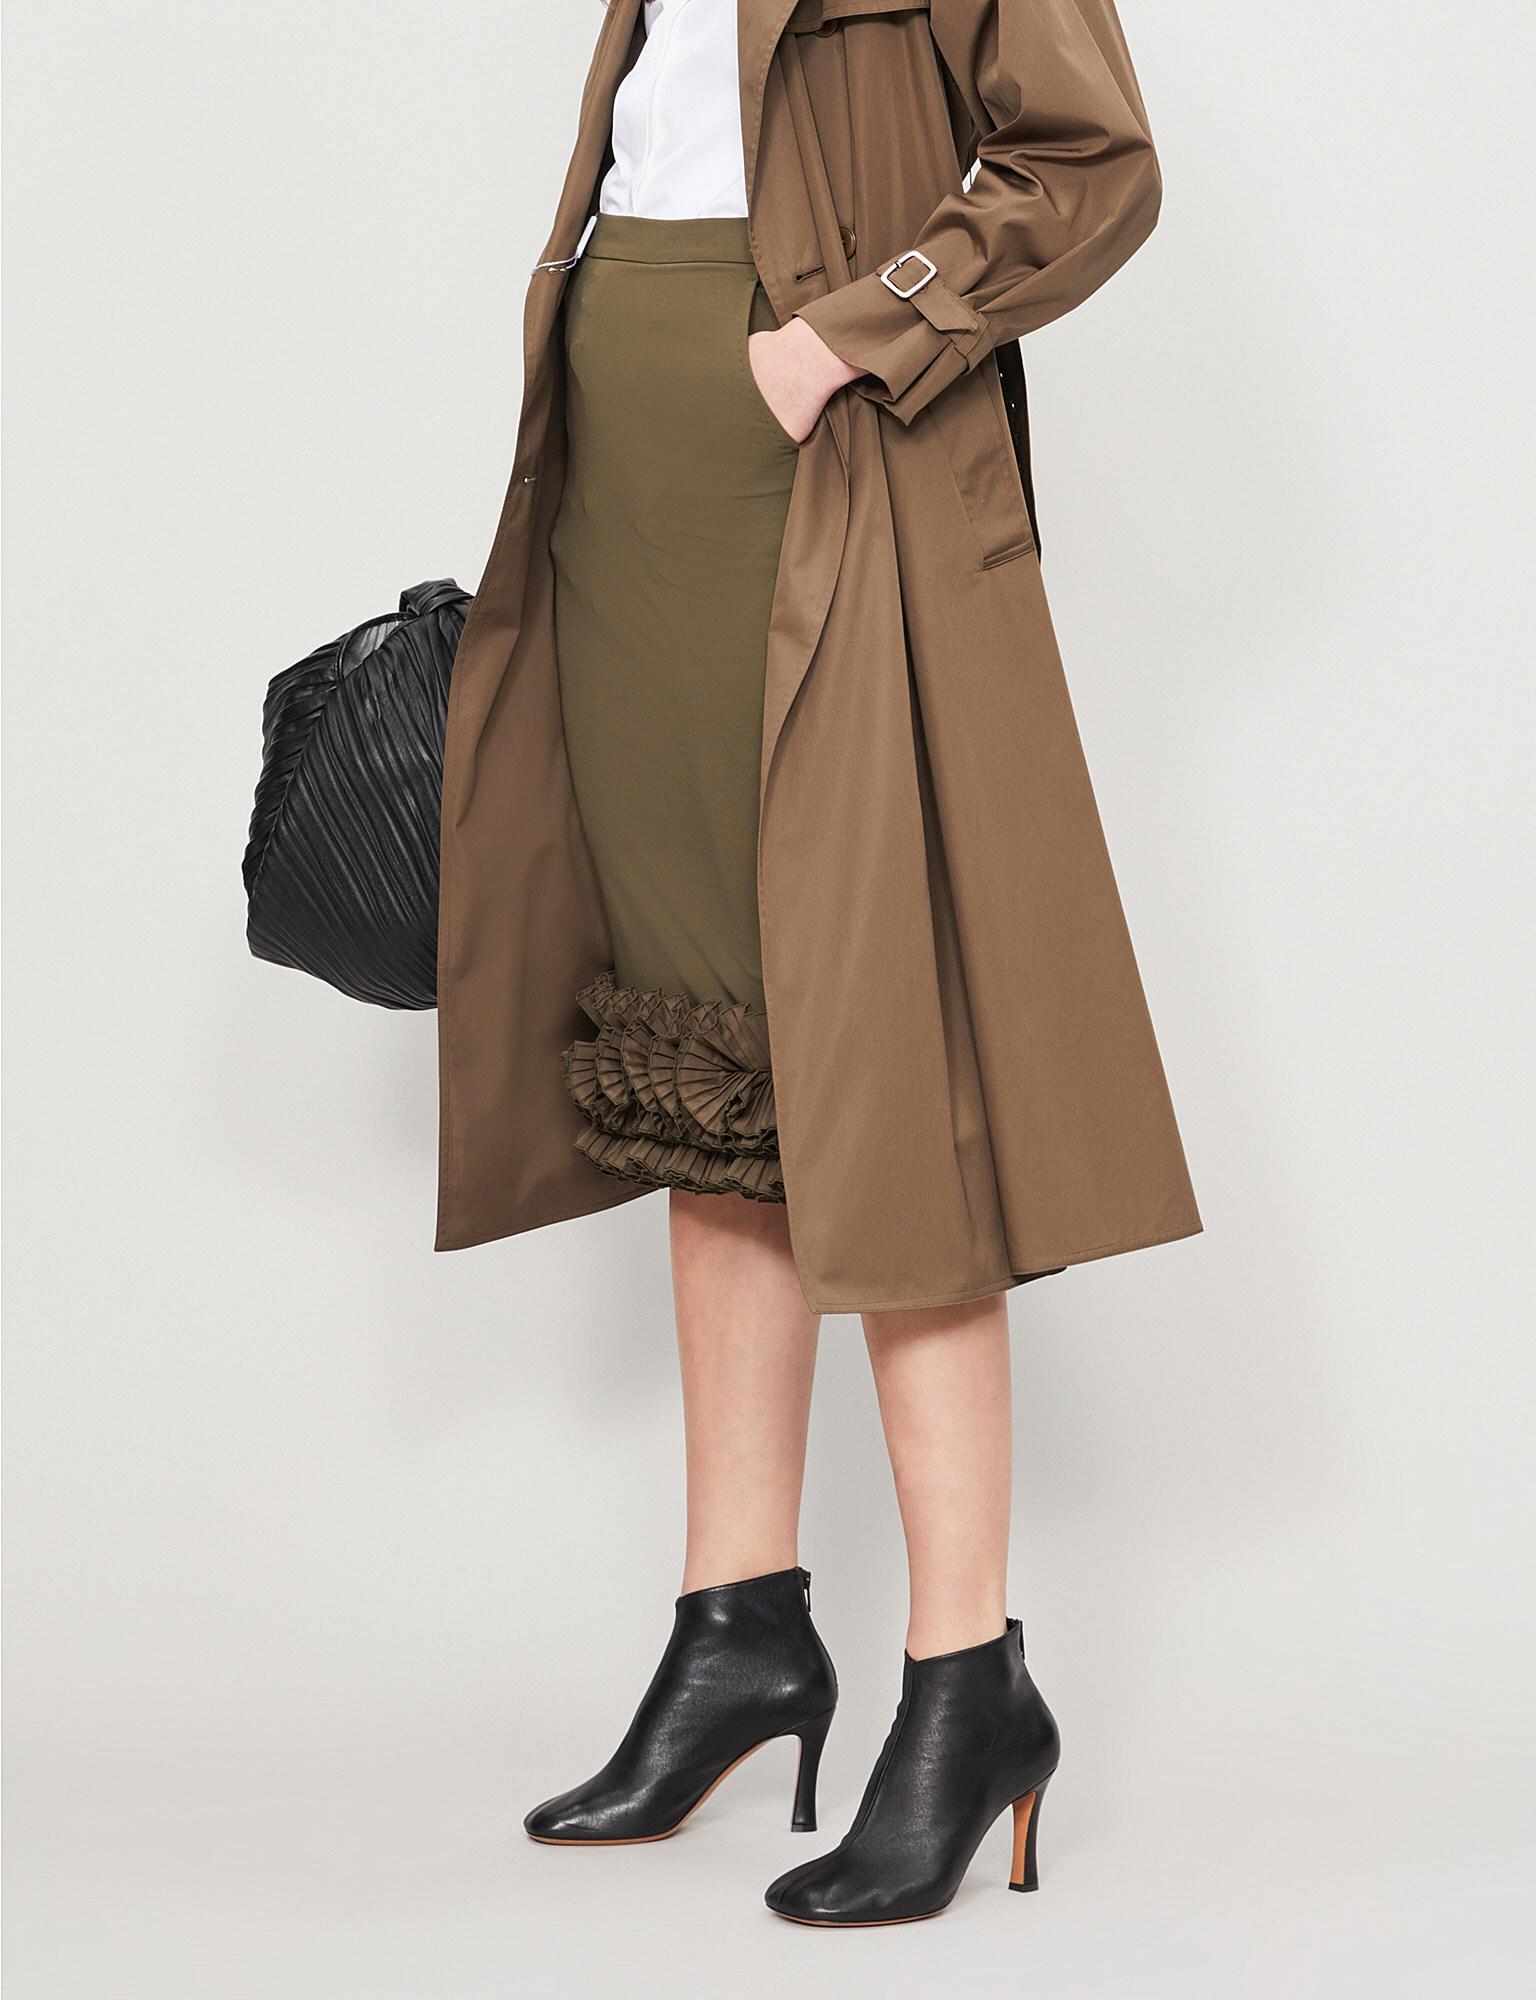 1b2cde1db Lyst - Max Mara Zircone Frilled-hem Crepe Skirt in Natural